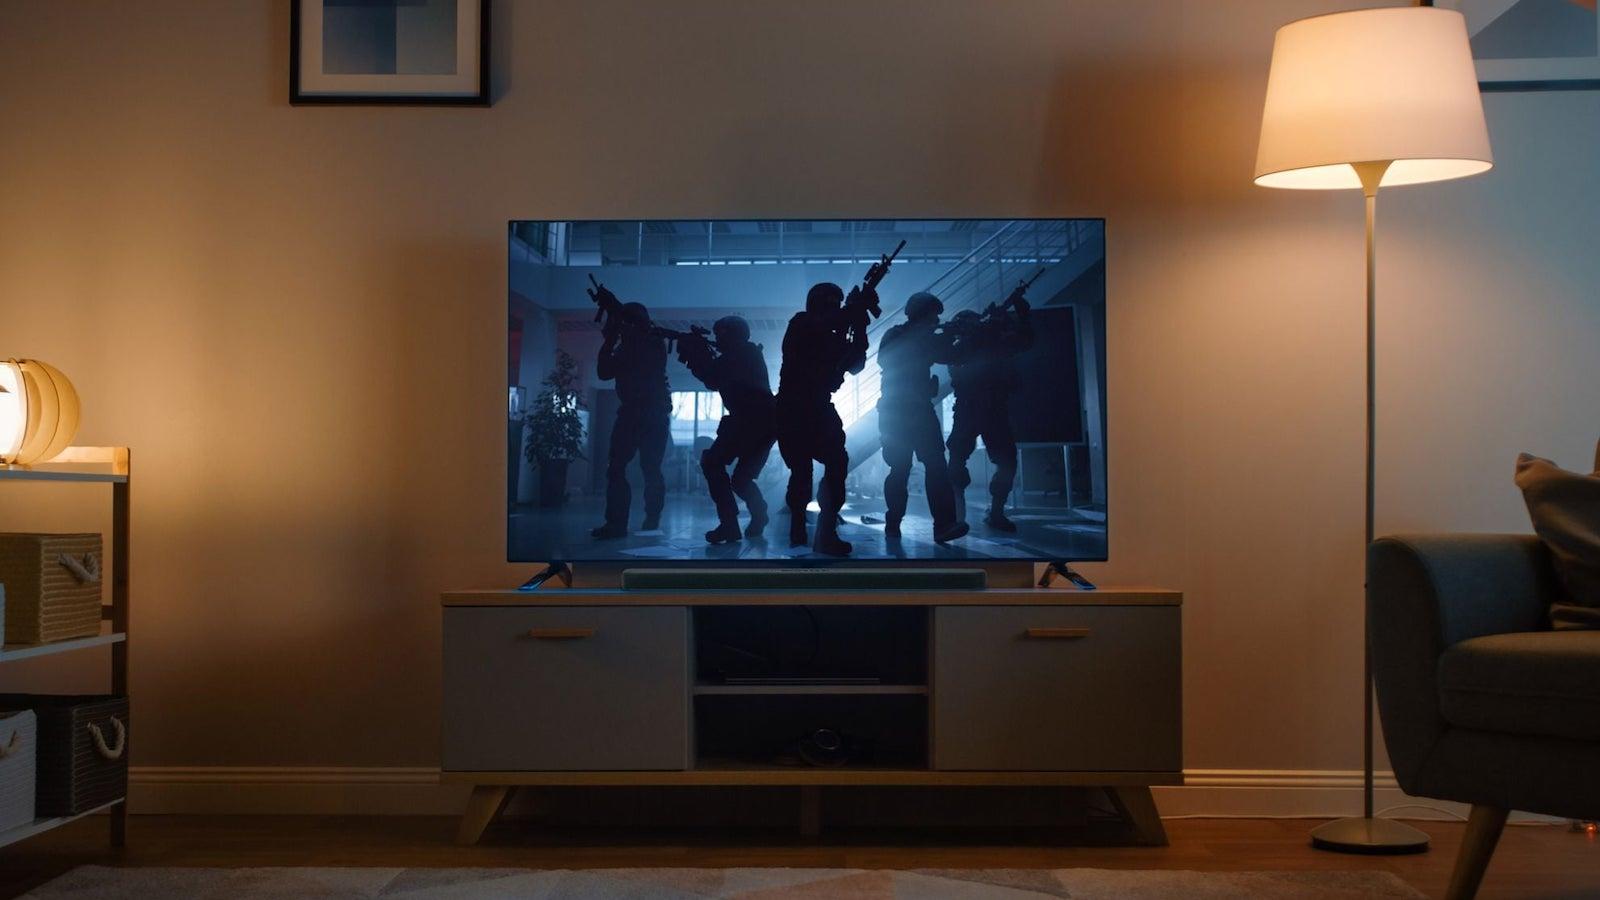 Yamaha SR-B20A home soundbar enhances dialogue clarity